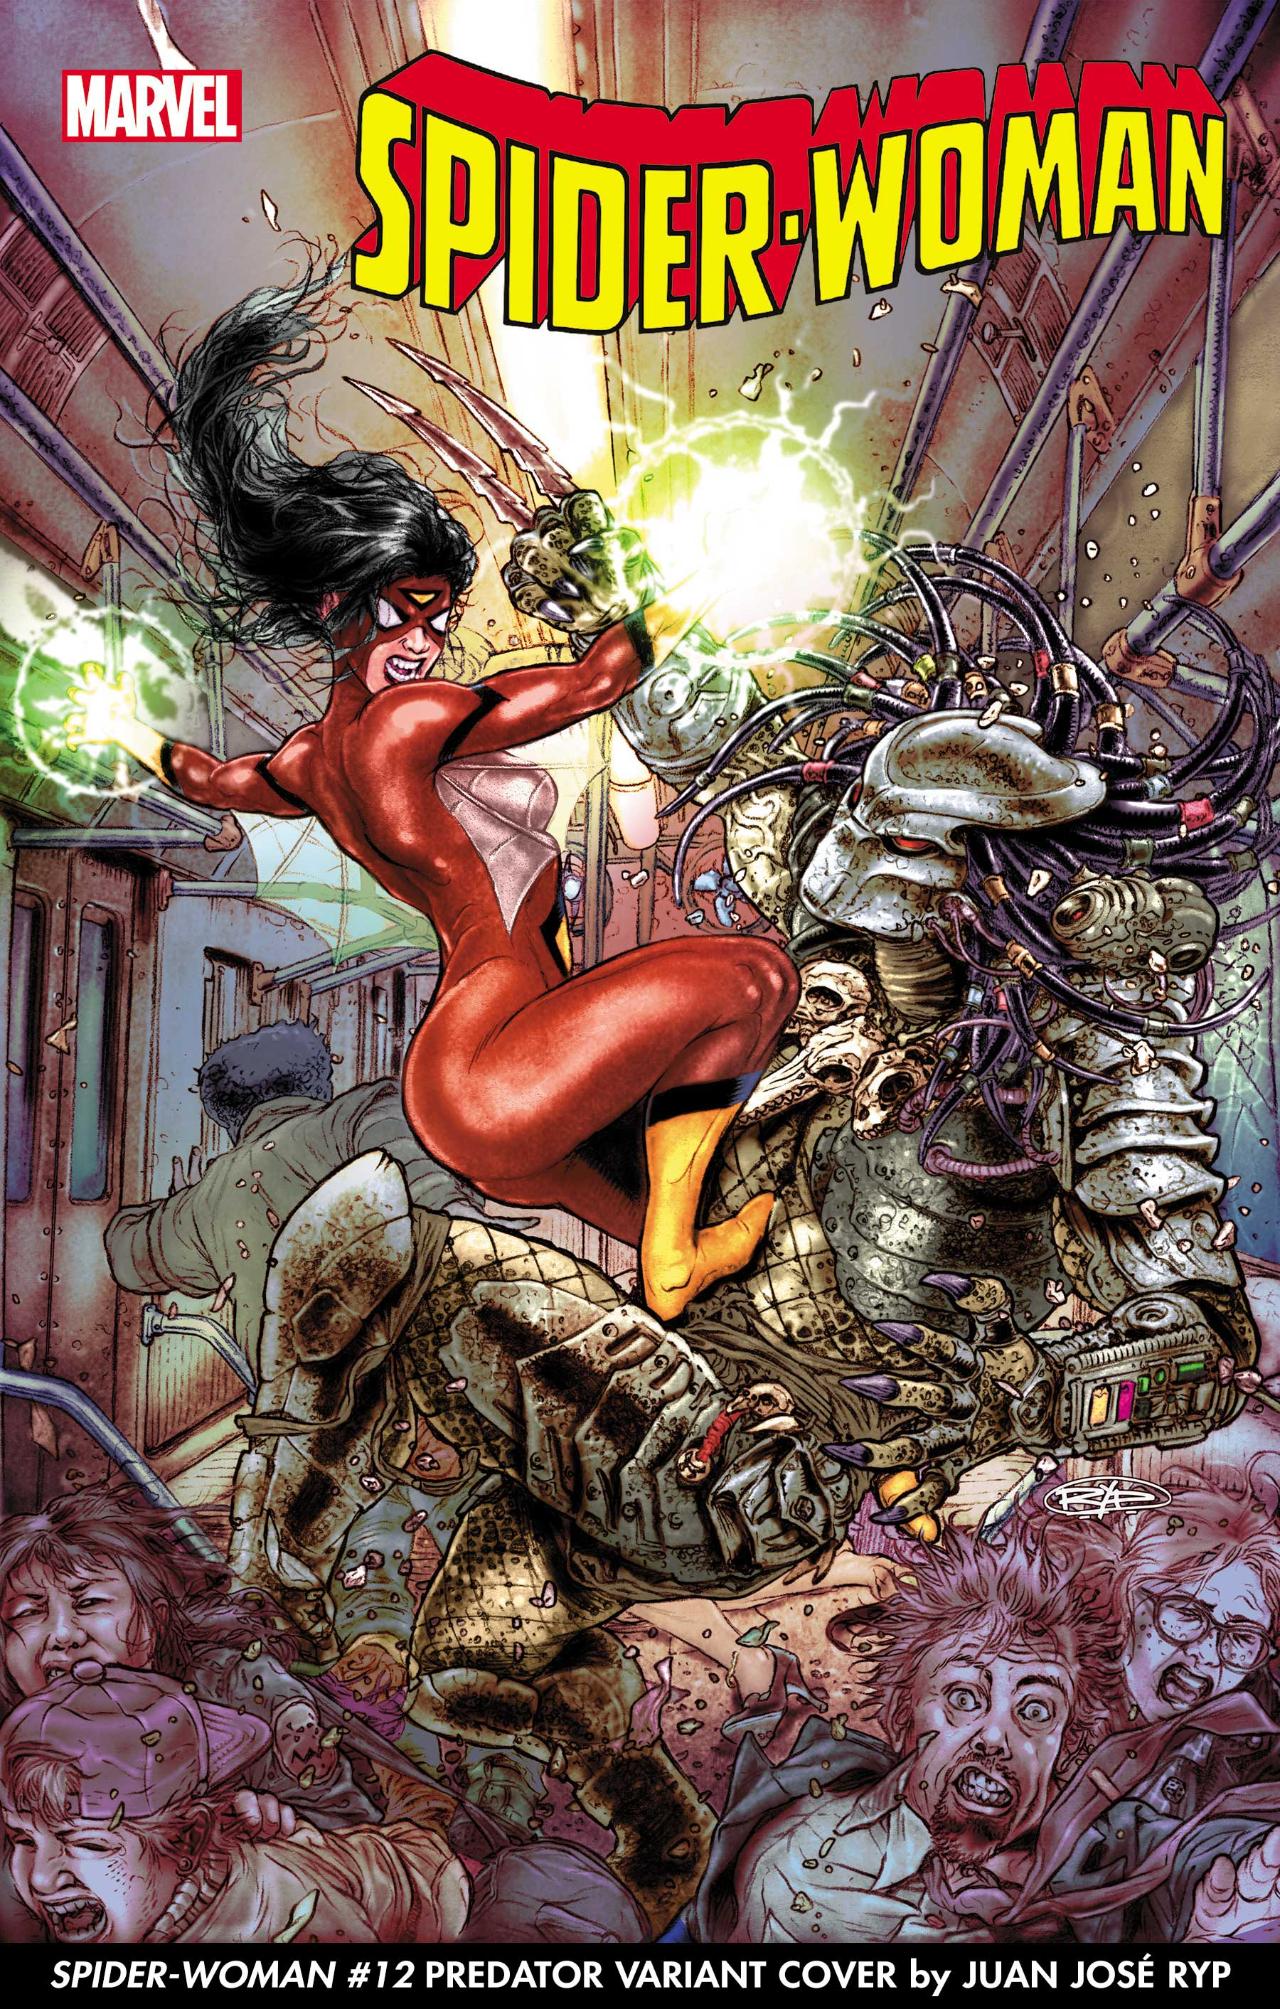 Portada de Predator vs.Marvel